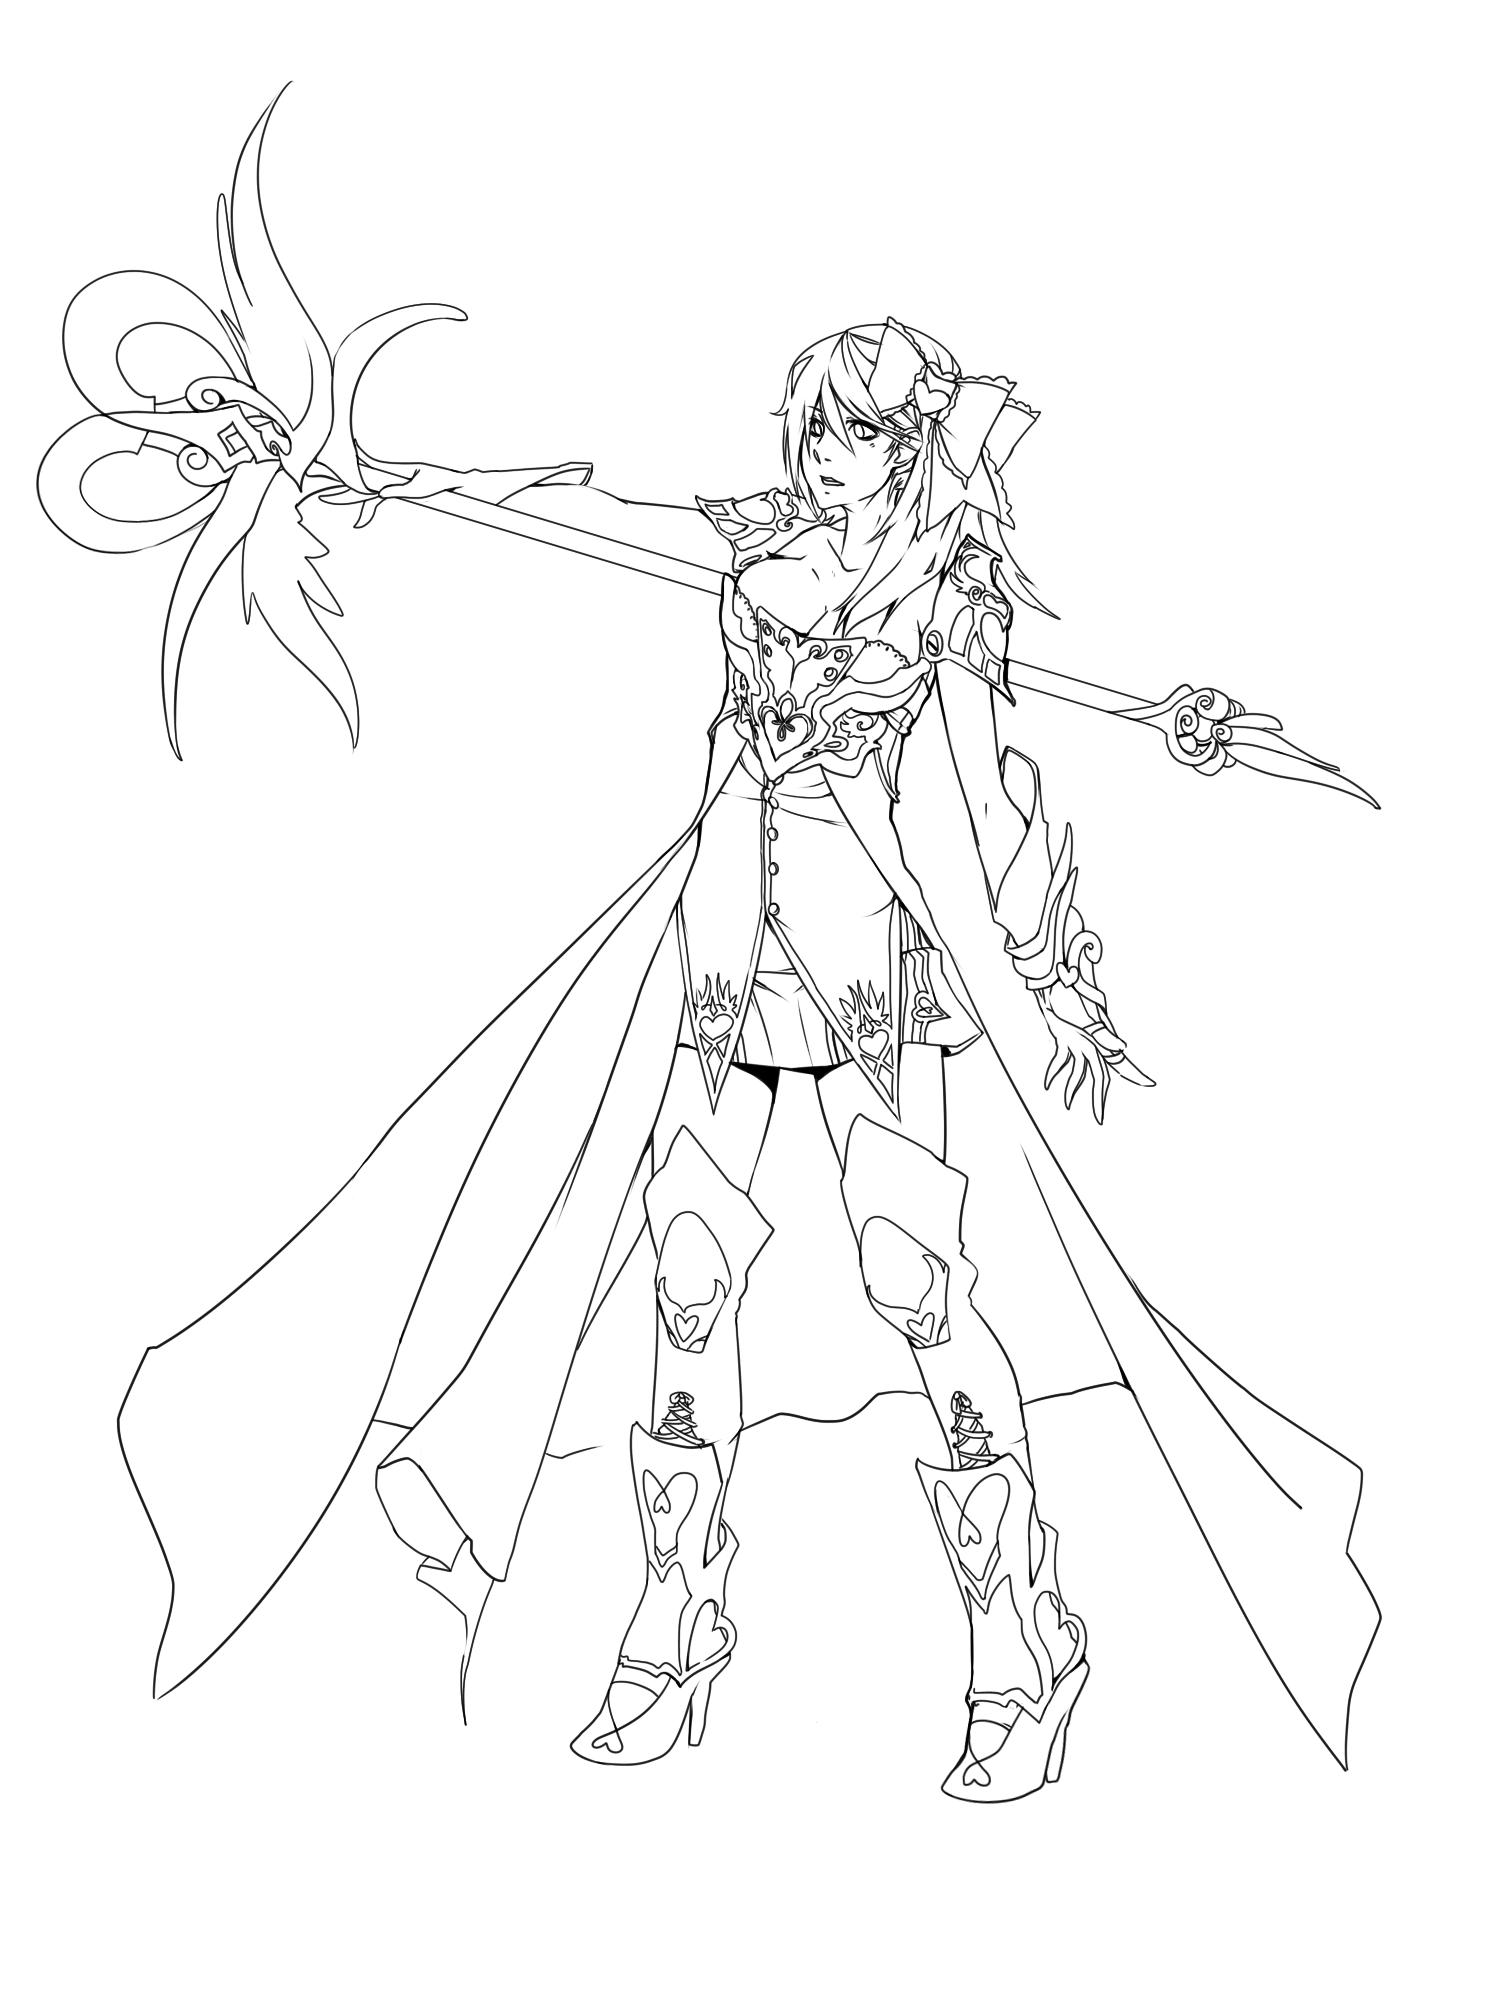 Valentine Knight by Girutea